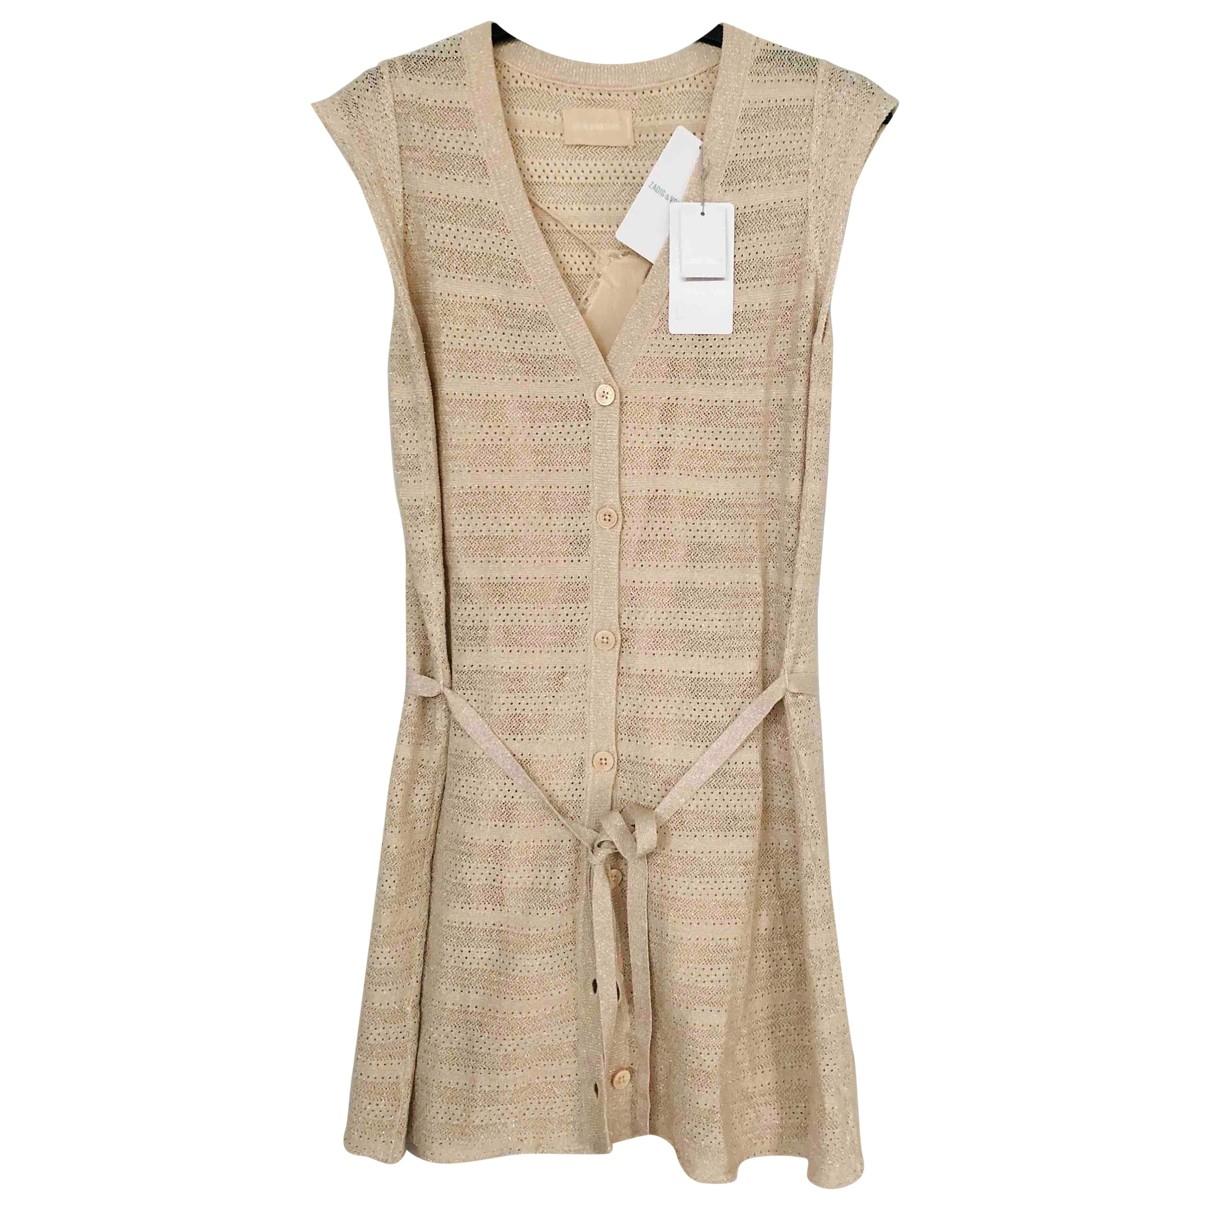 Zadig & Voltaire \N Pink dress for Women S International